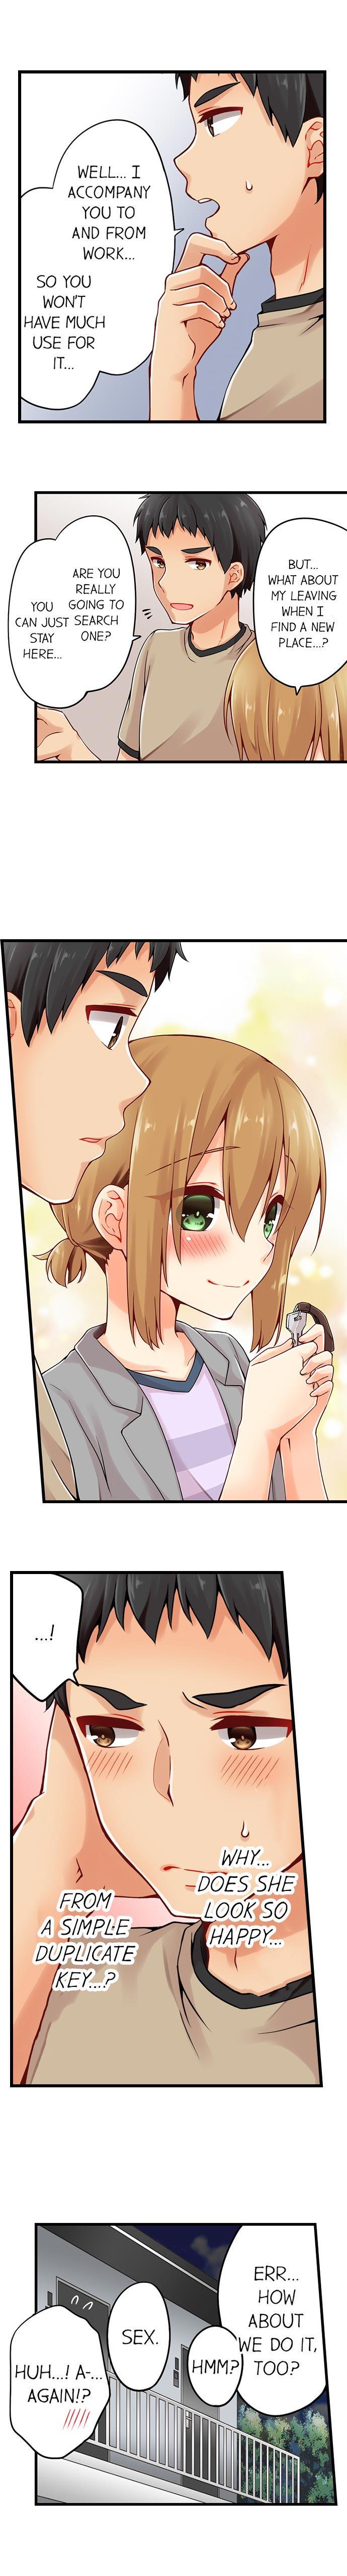 Ren Arisugawa Is Actually A Girl 437